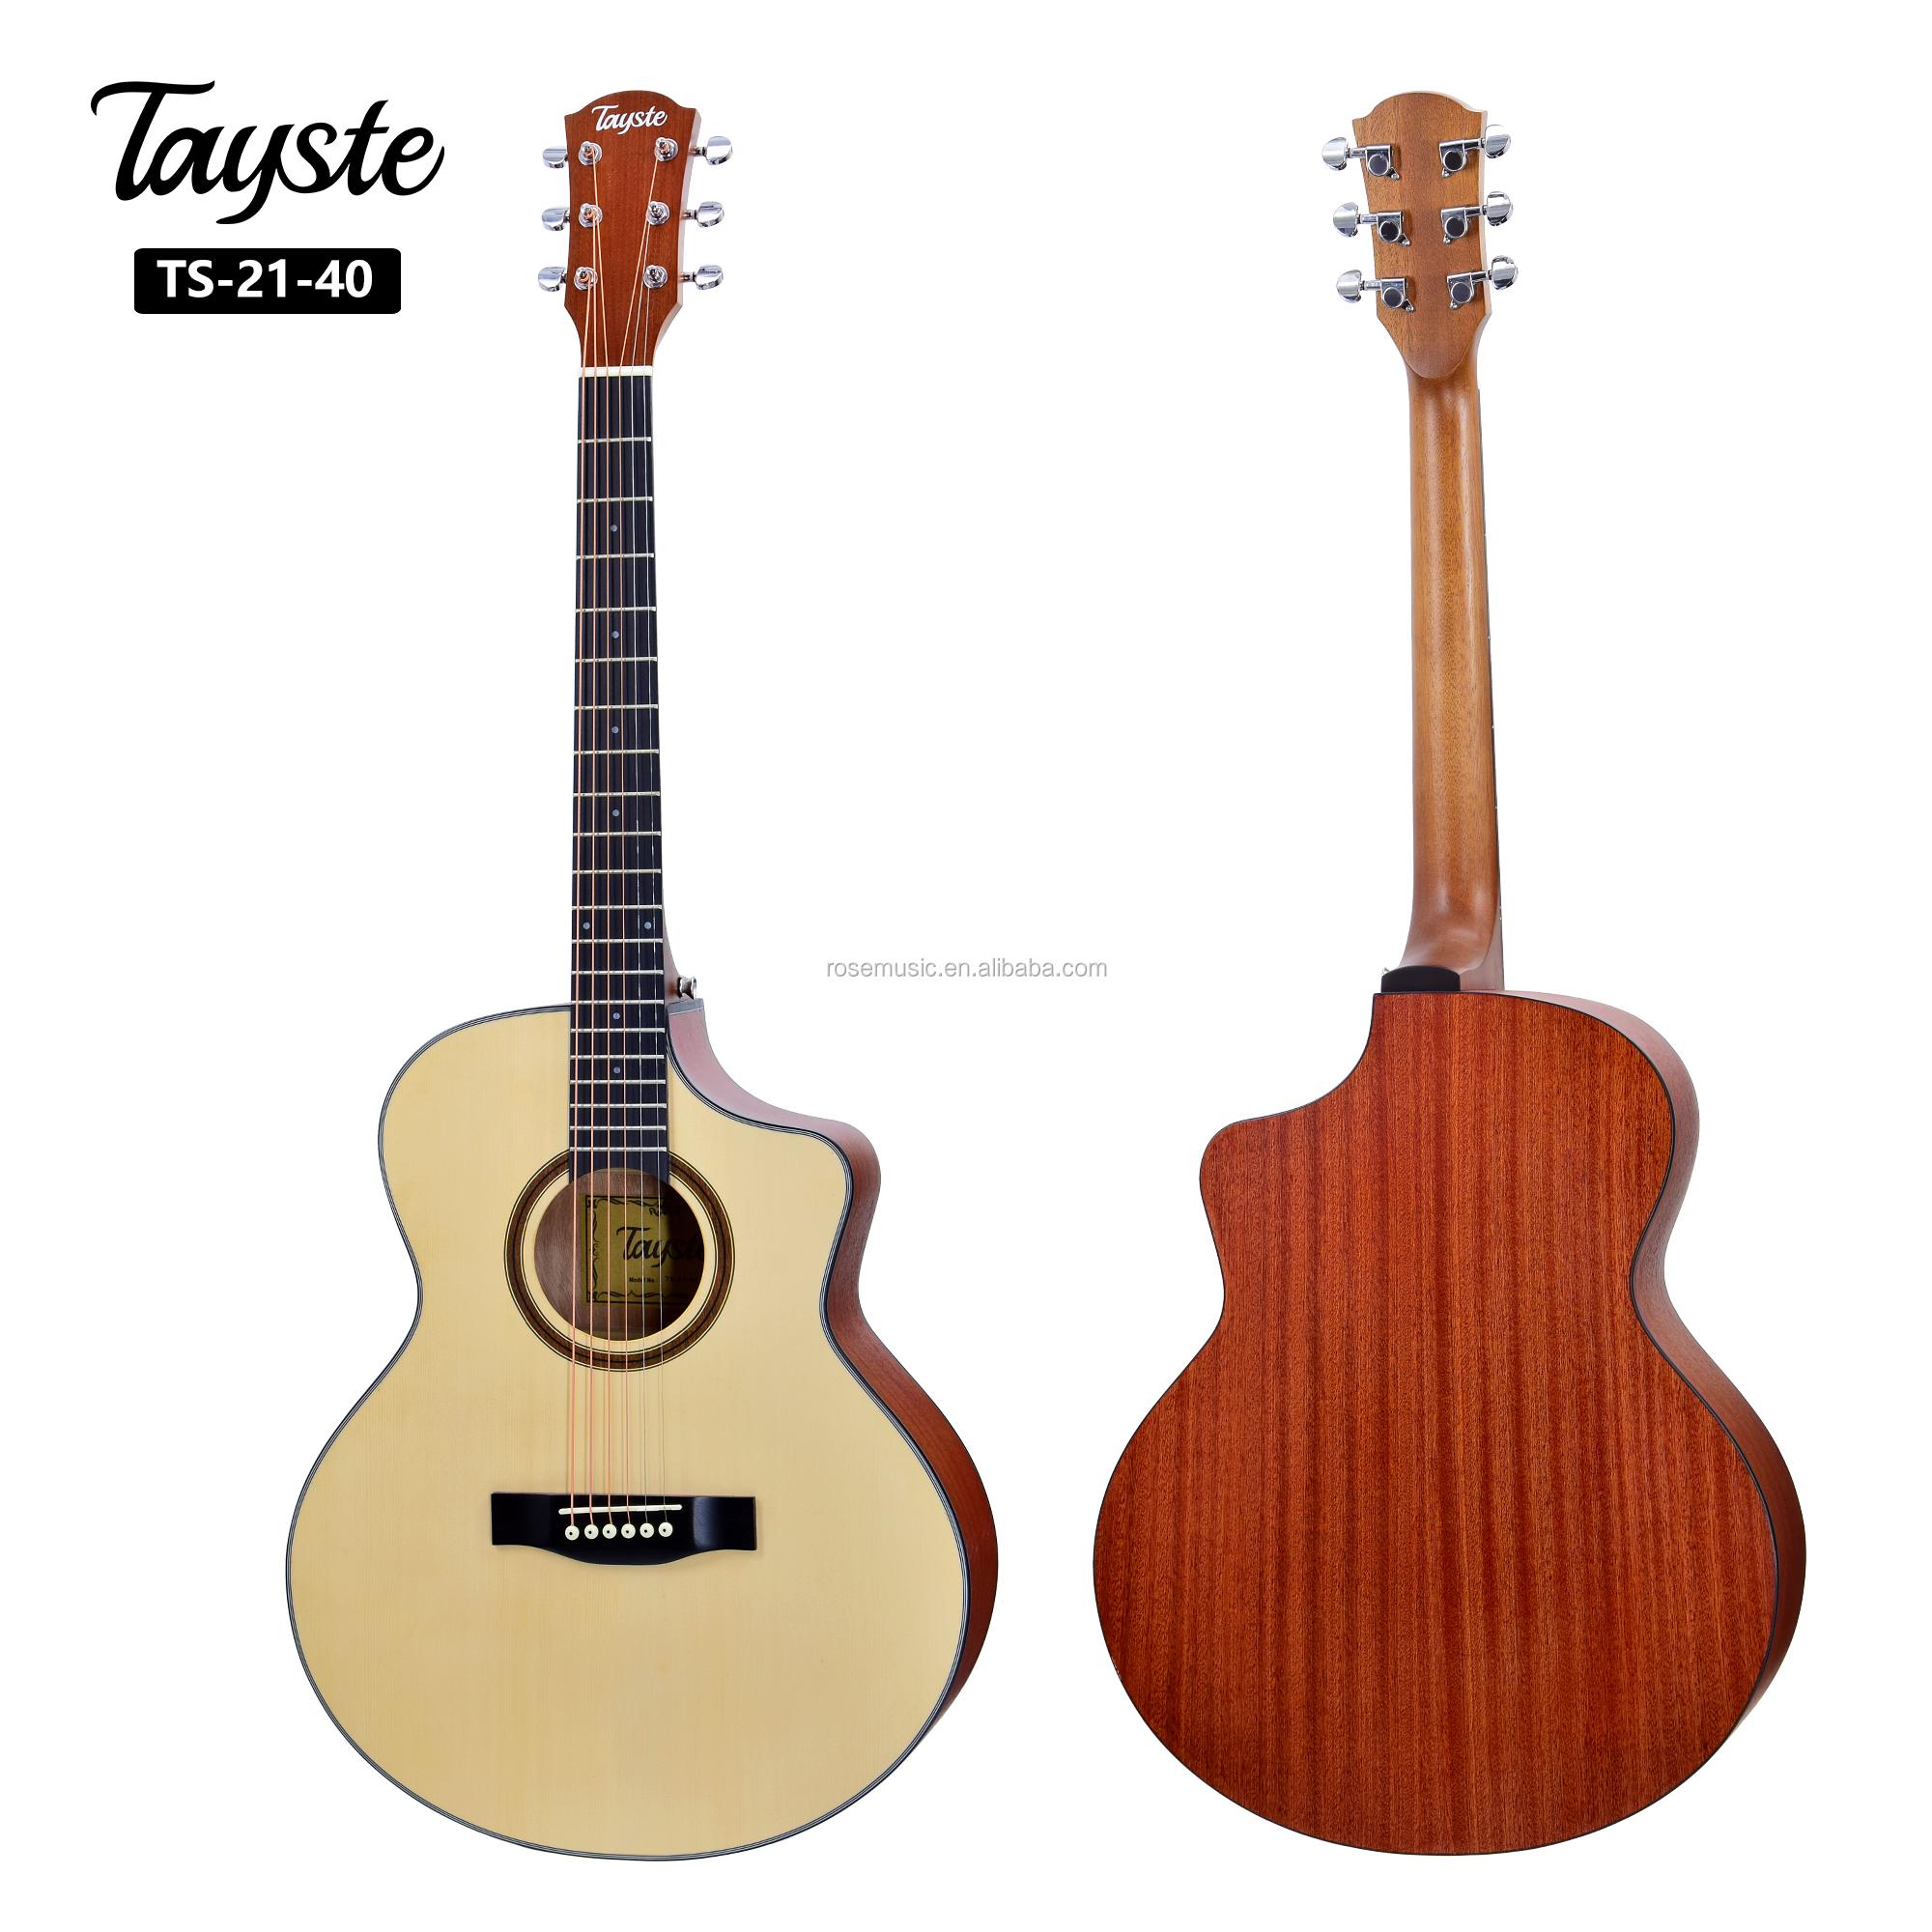 hot selling tayste inch oem handmade acoustic guitar made in